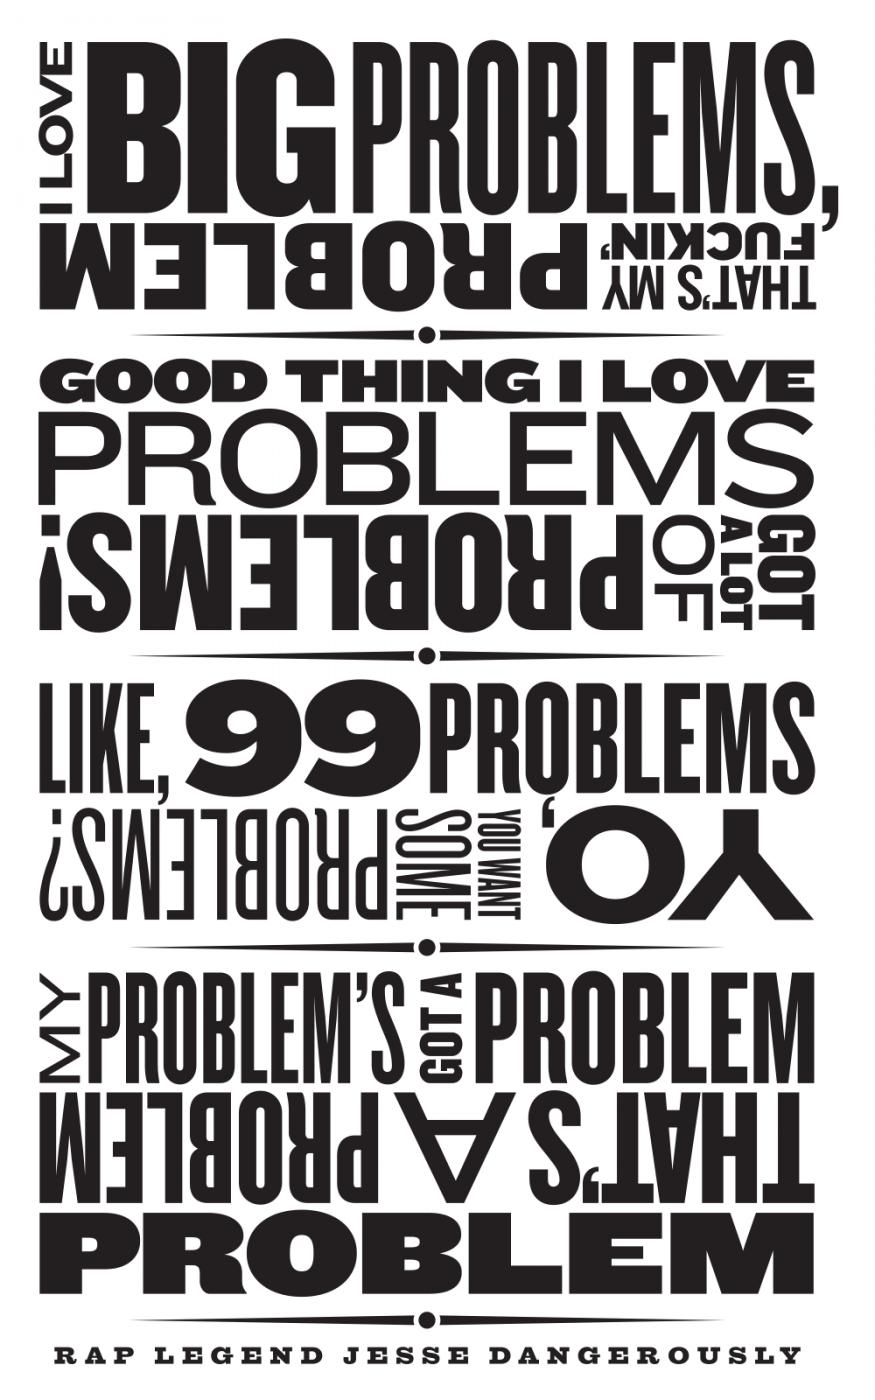 jesse-dangerously-problems-t-shirt-4